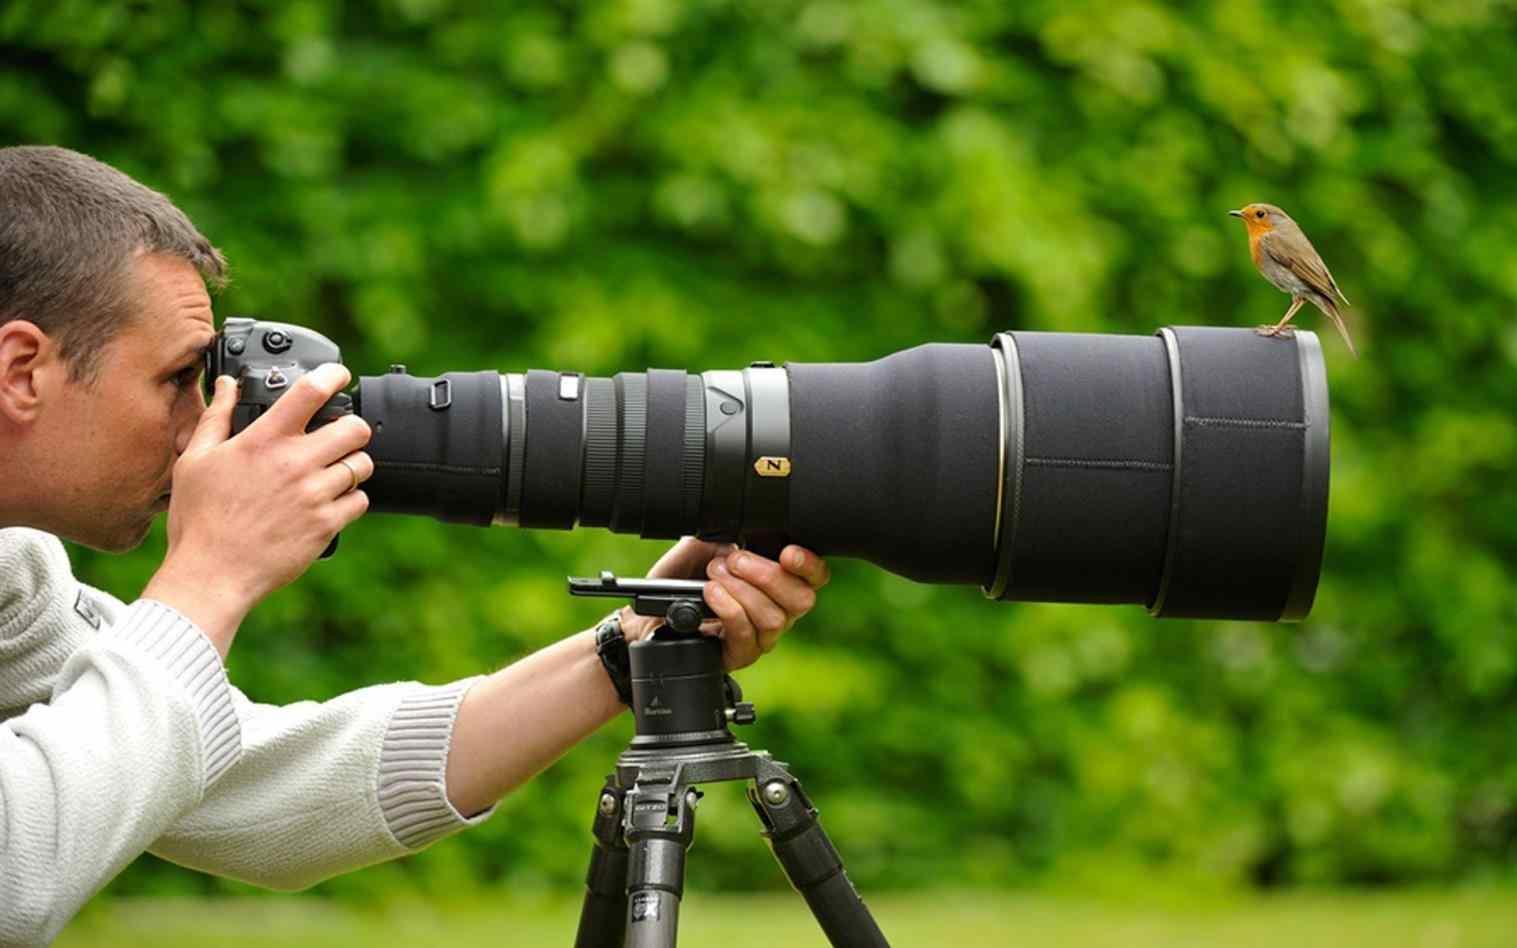 Canon Camera Photography Wallpaper Professional Photography Cameras 1517x948 Wallpaper Teahub Io